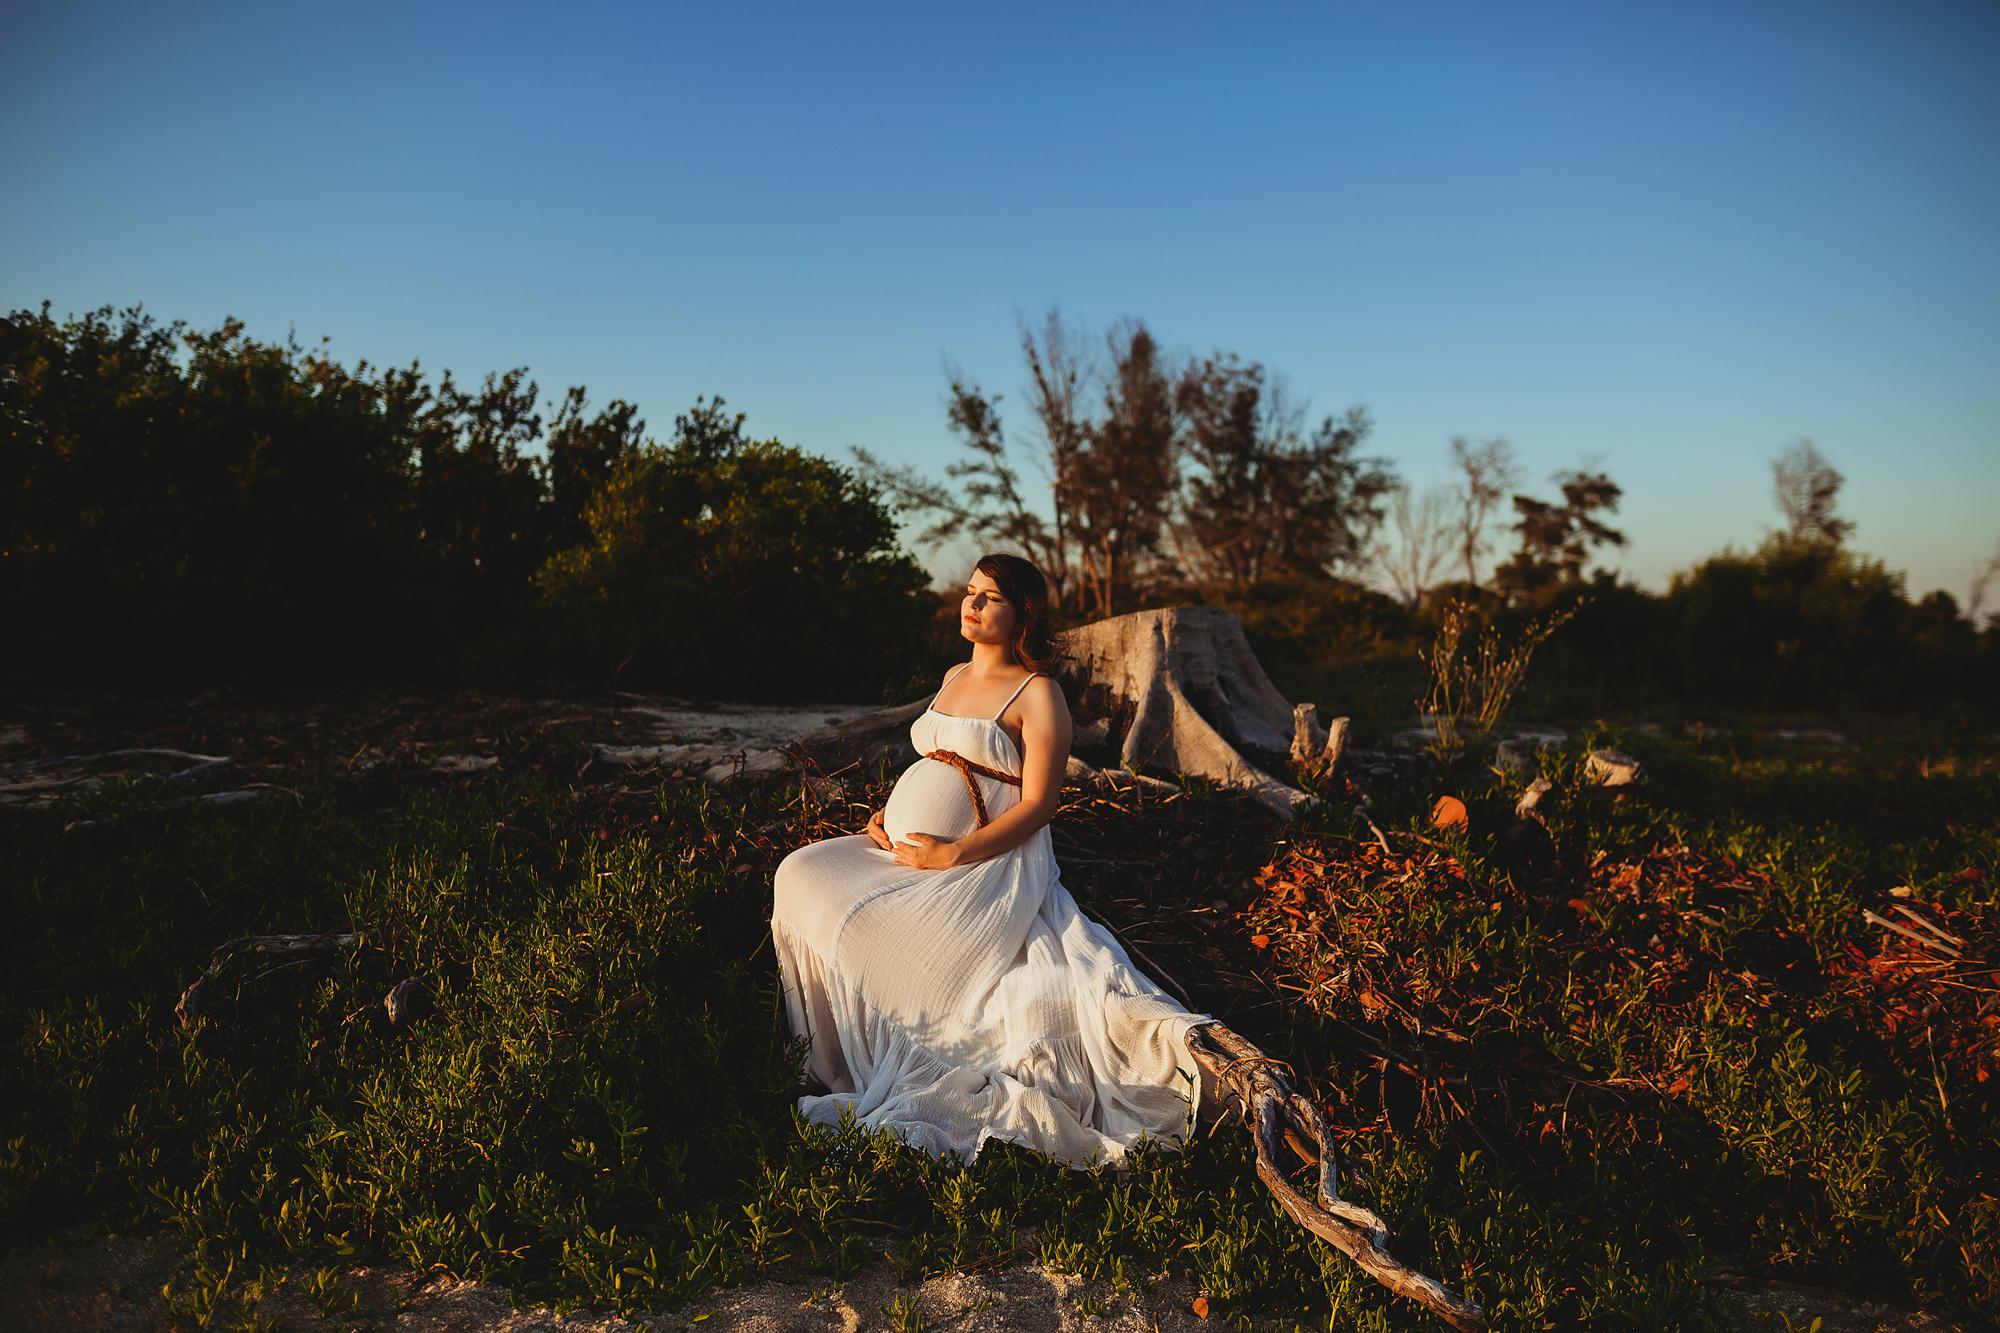 fine art maternity photographer, tampa bay photographer